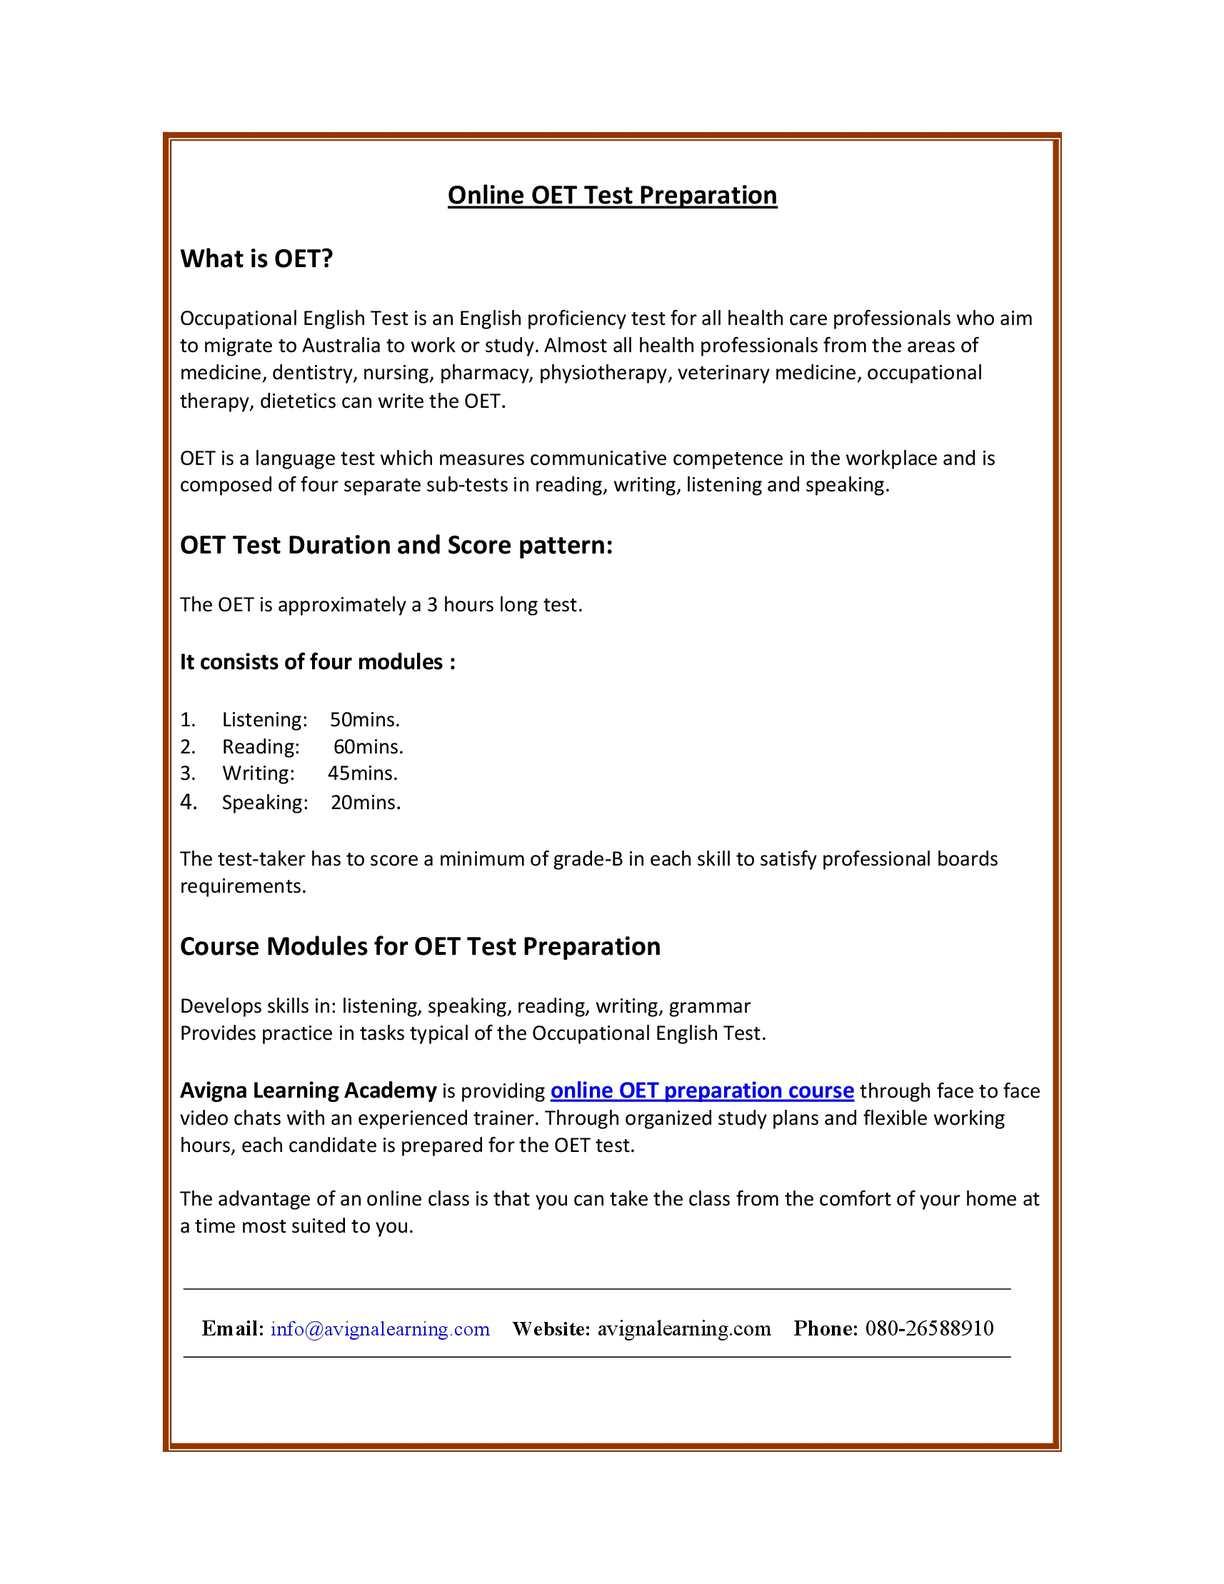 OET online preparation